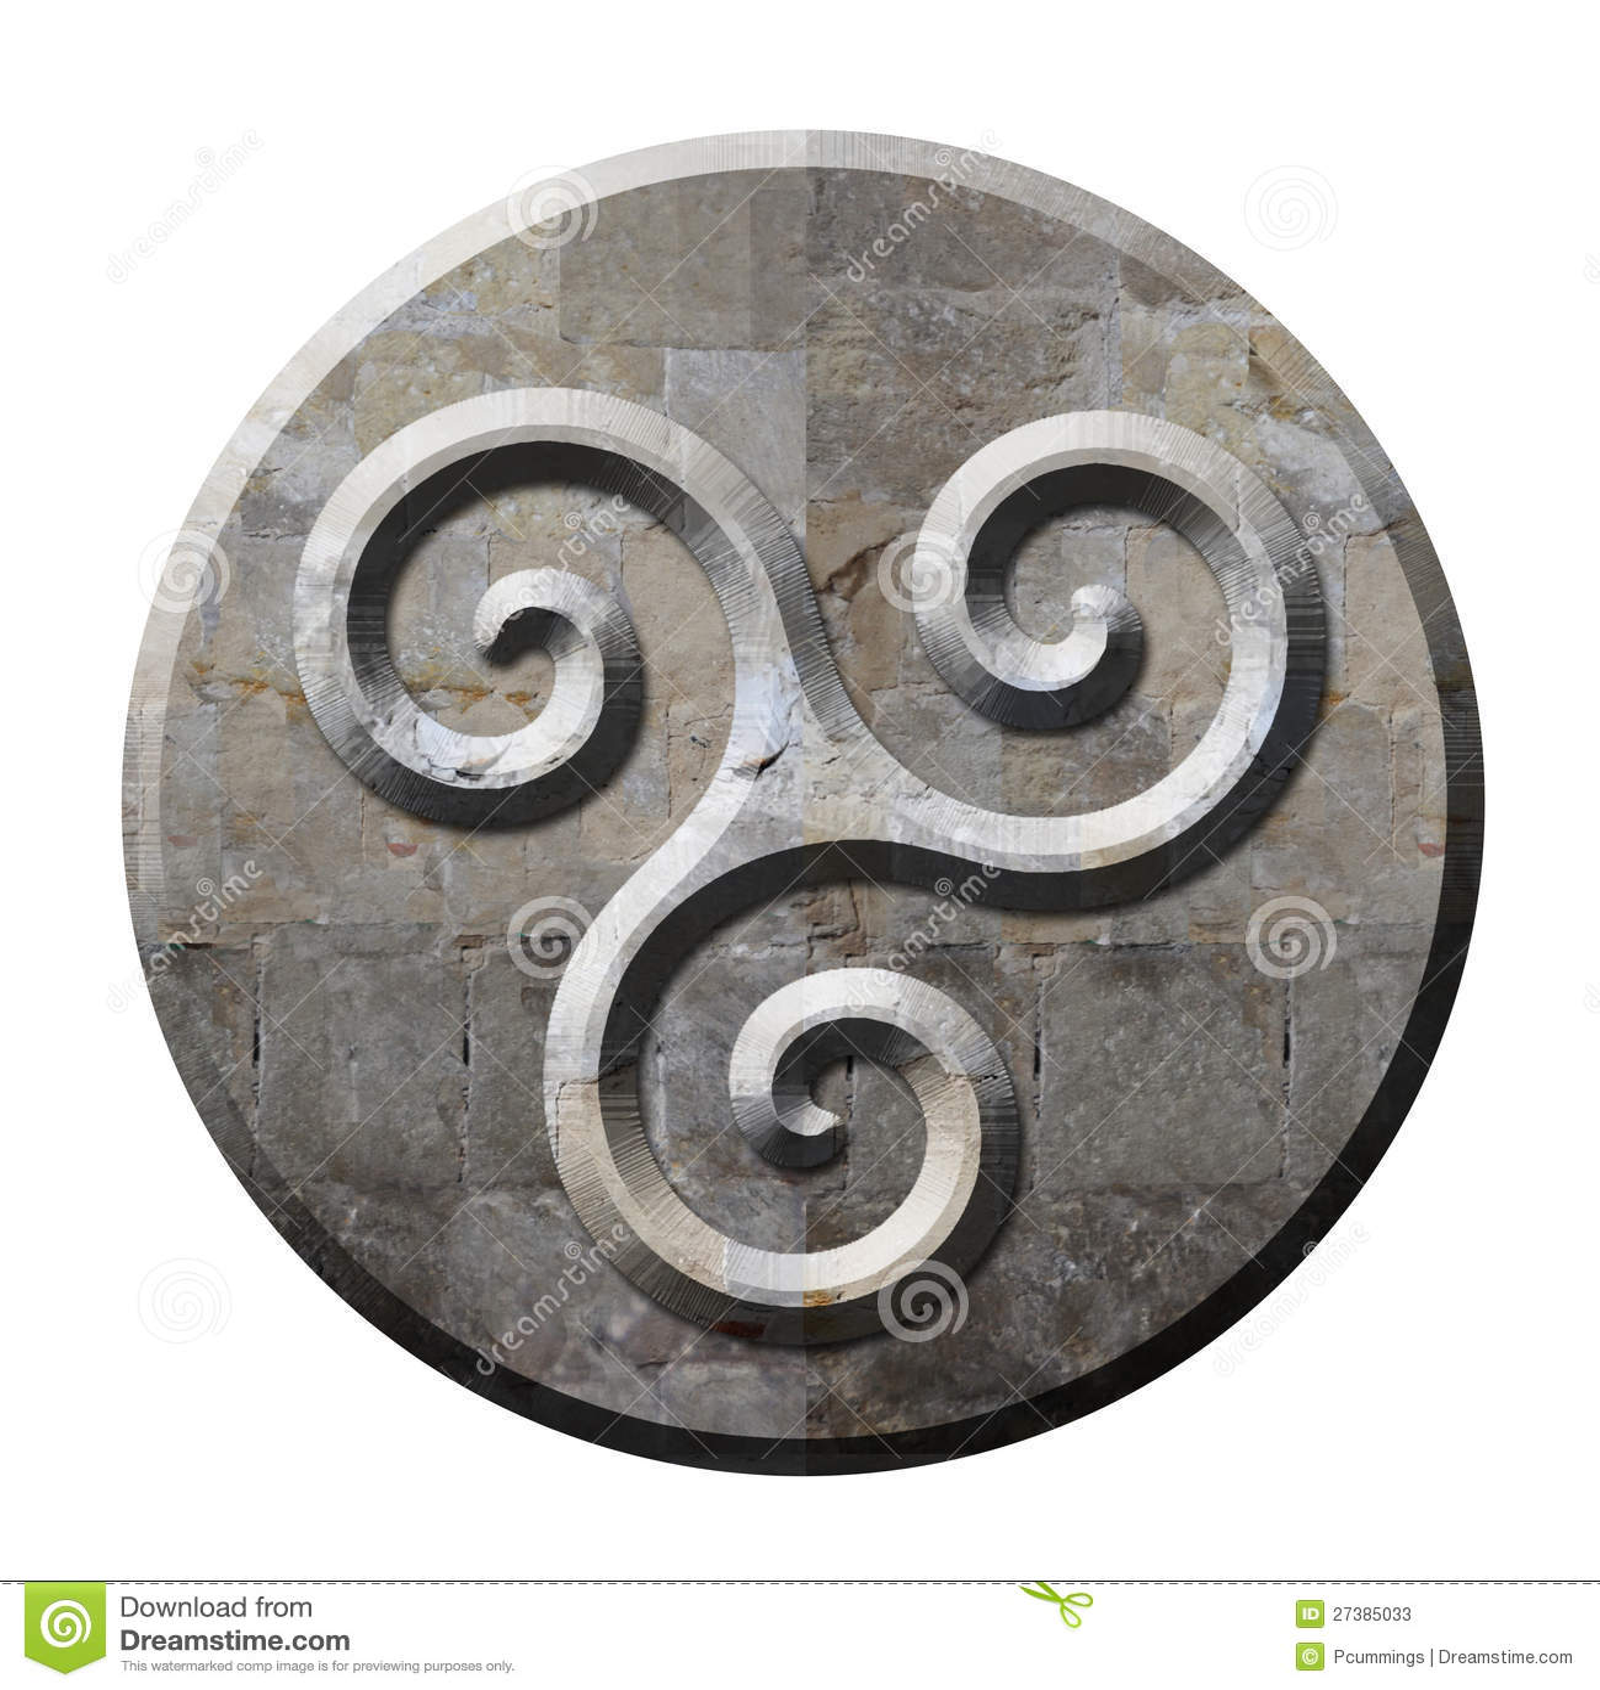 Ancient celtic triskele symbol in stone stock illustration ancient celtic triskele symbol in stone buycottarizona Images